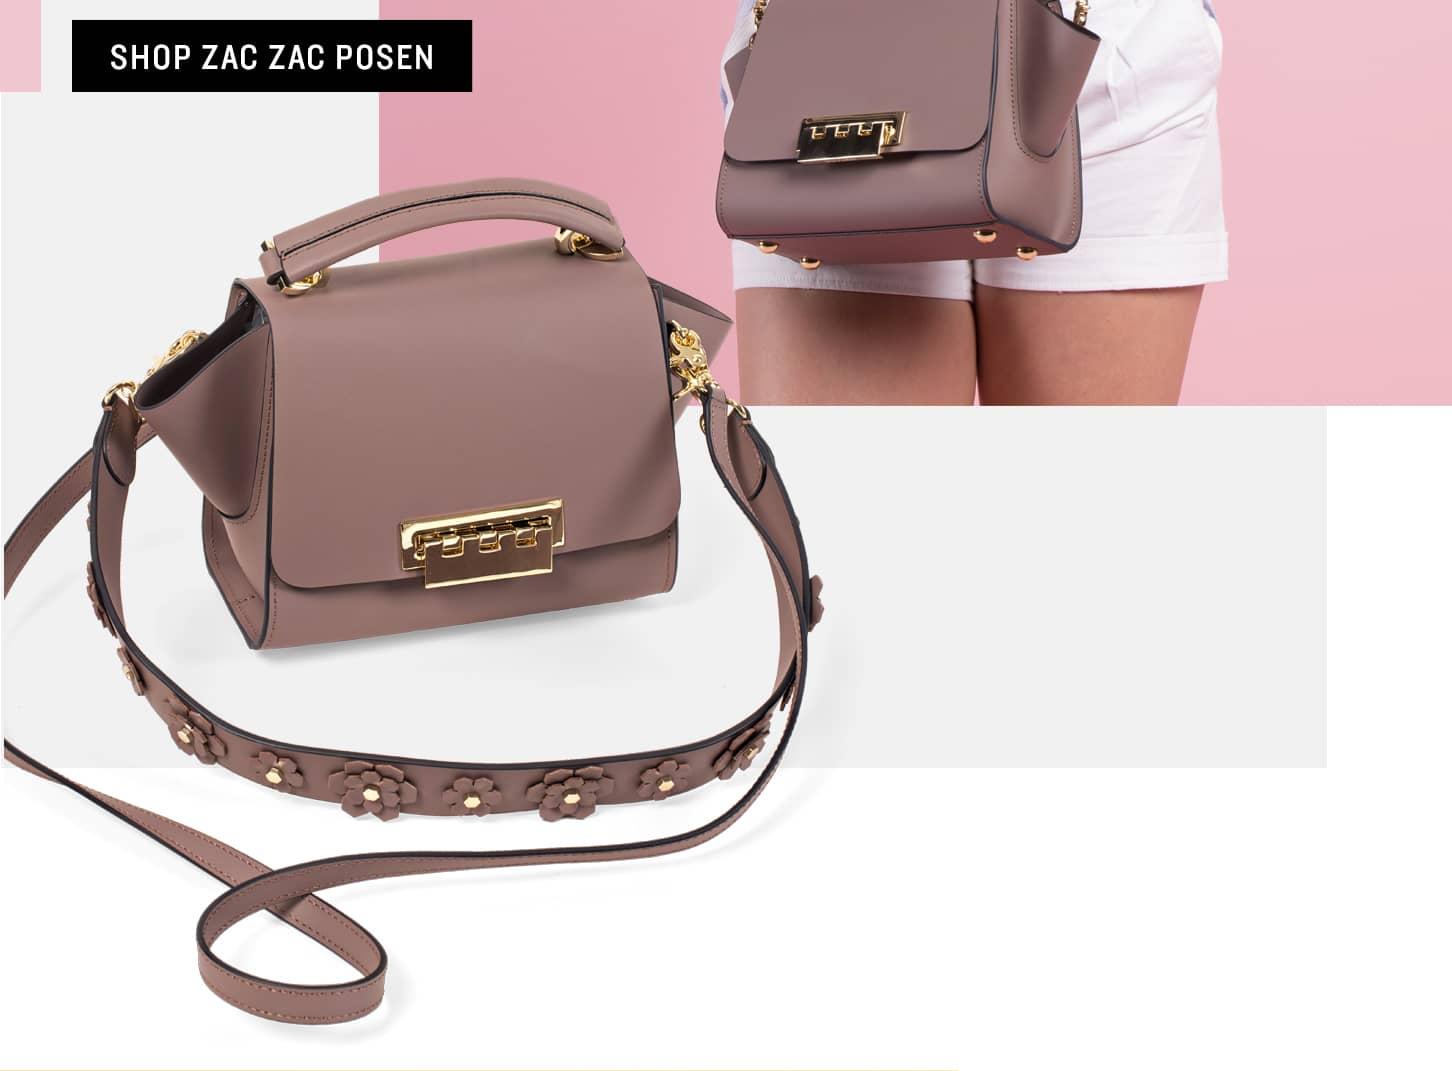 Shop ZAC Zac Posen